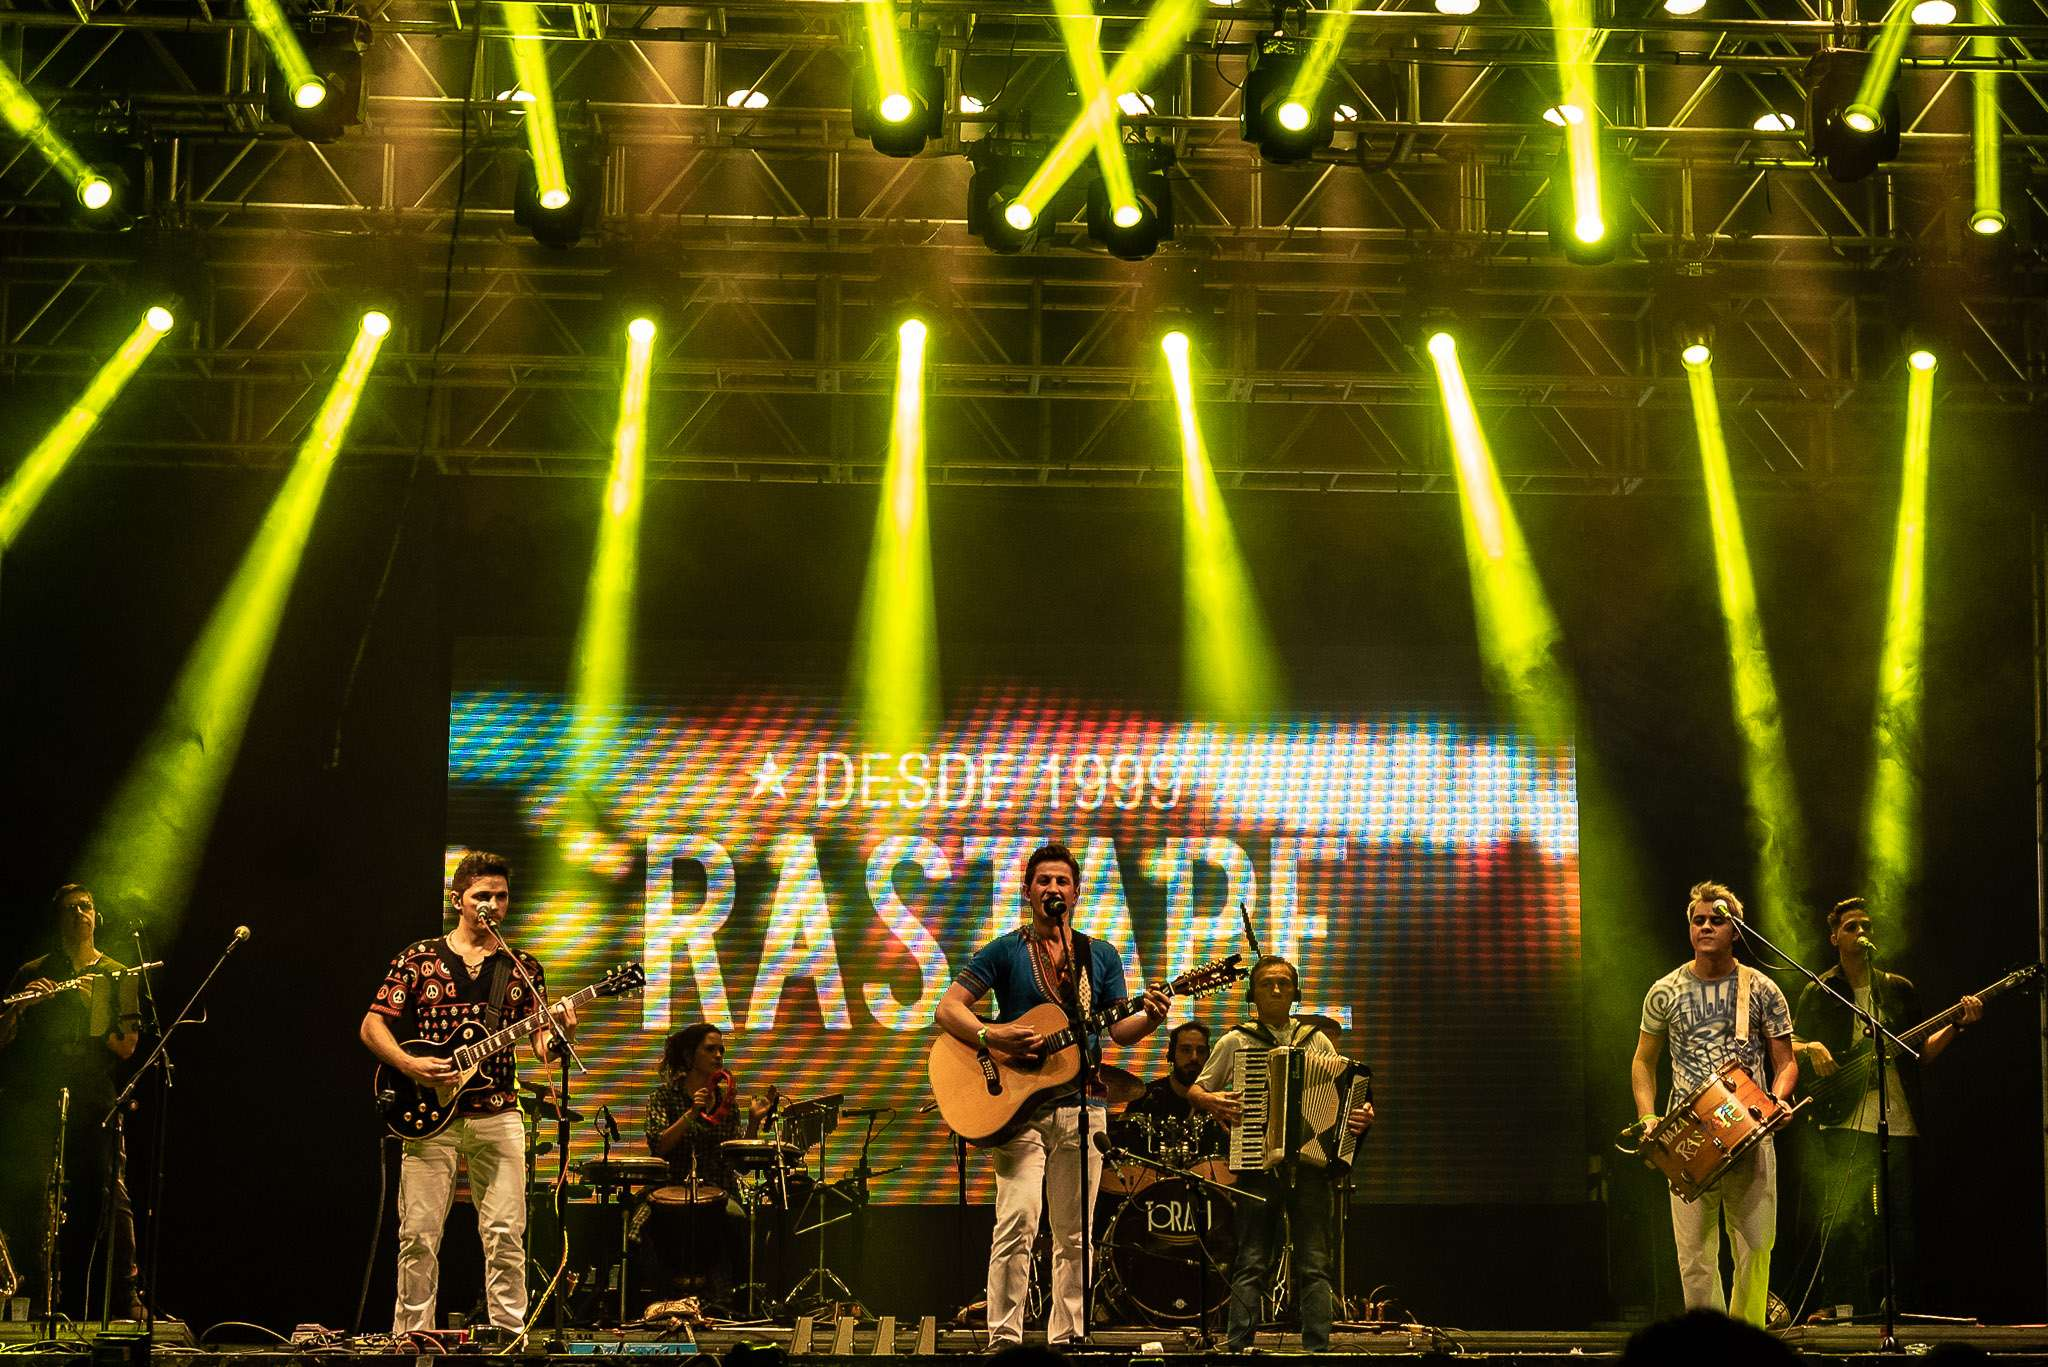 Banda de Forró Rastapé no Arena Vip de Osasco